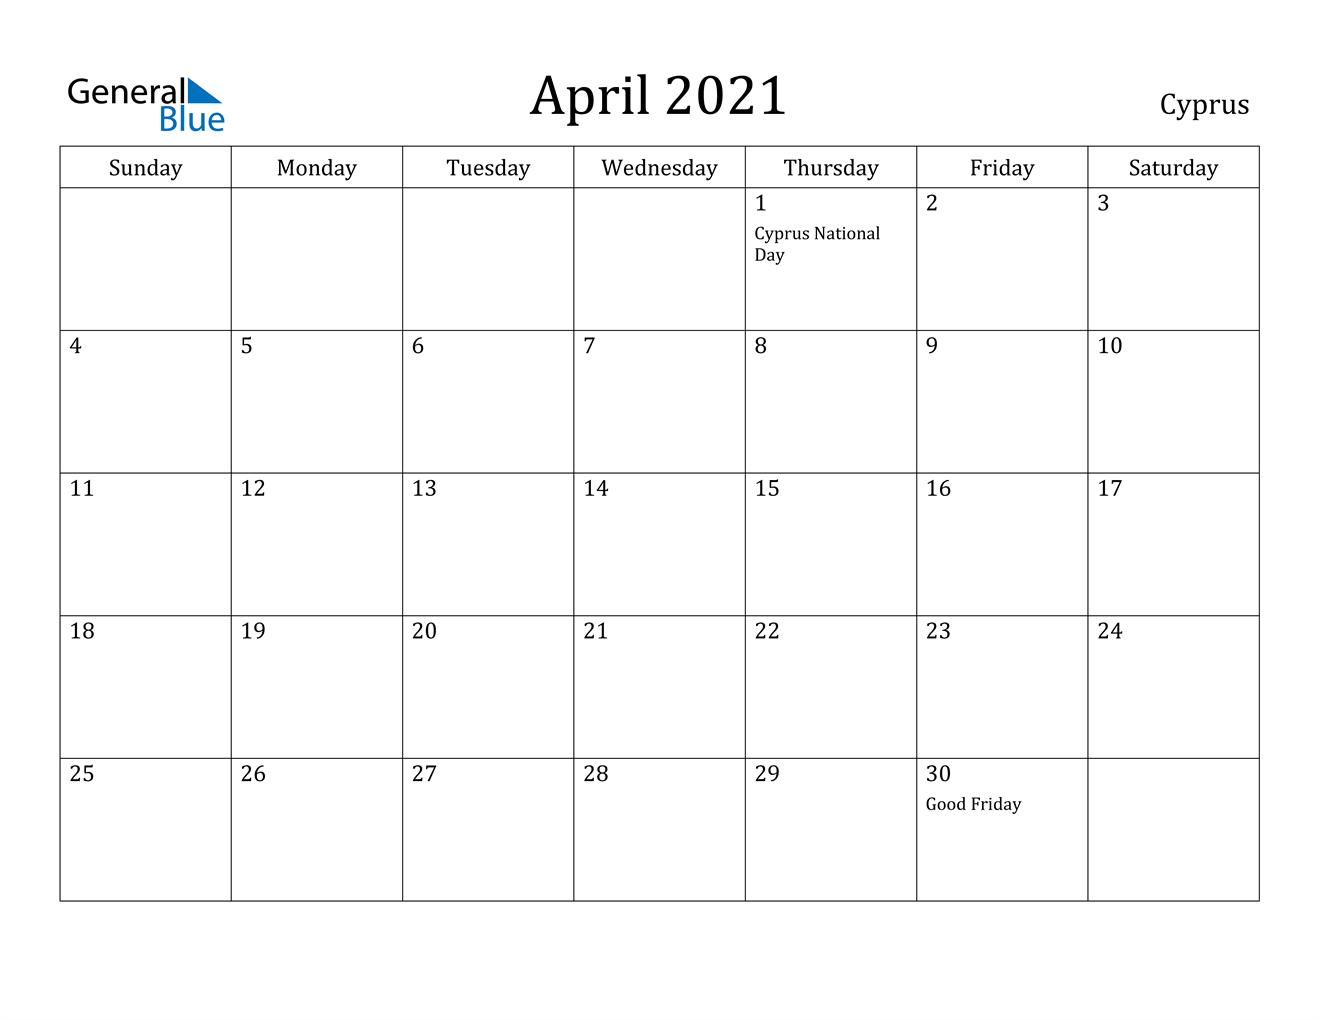 April 2021 Calendar - Cyprus